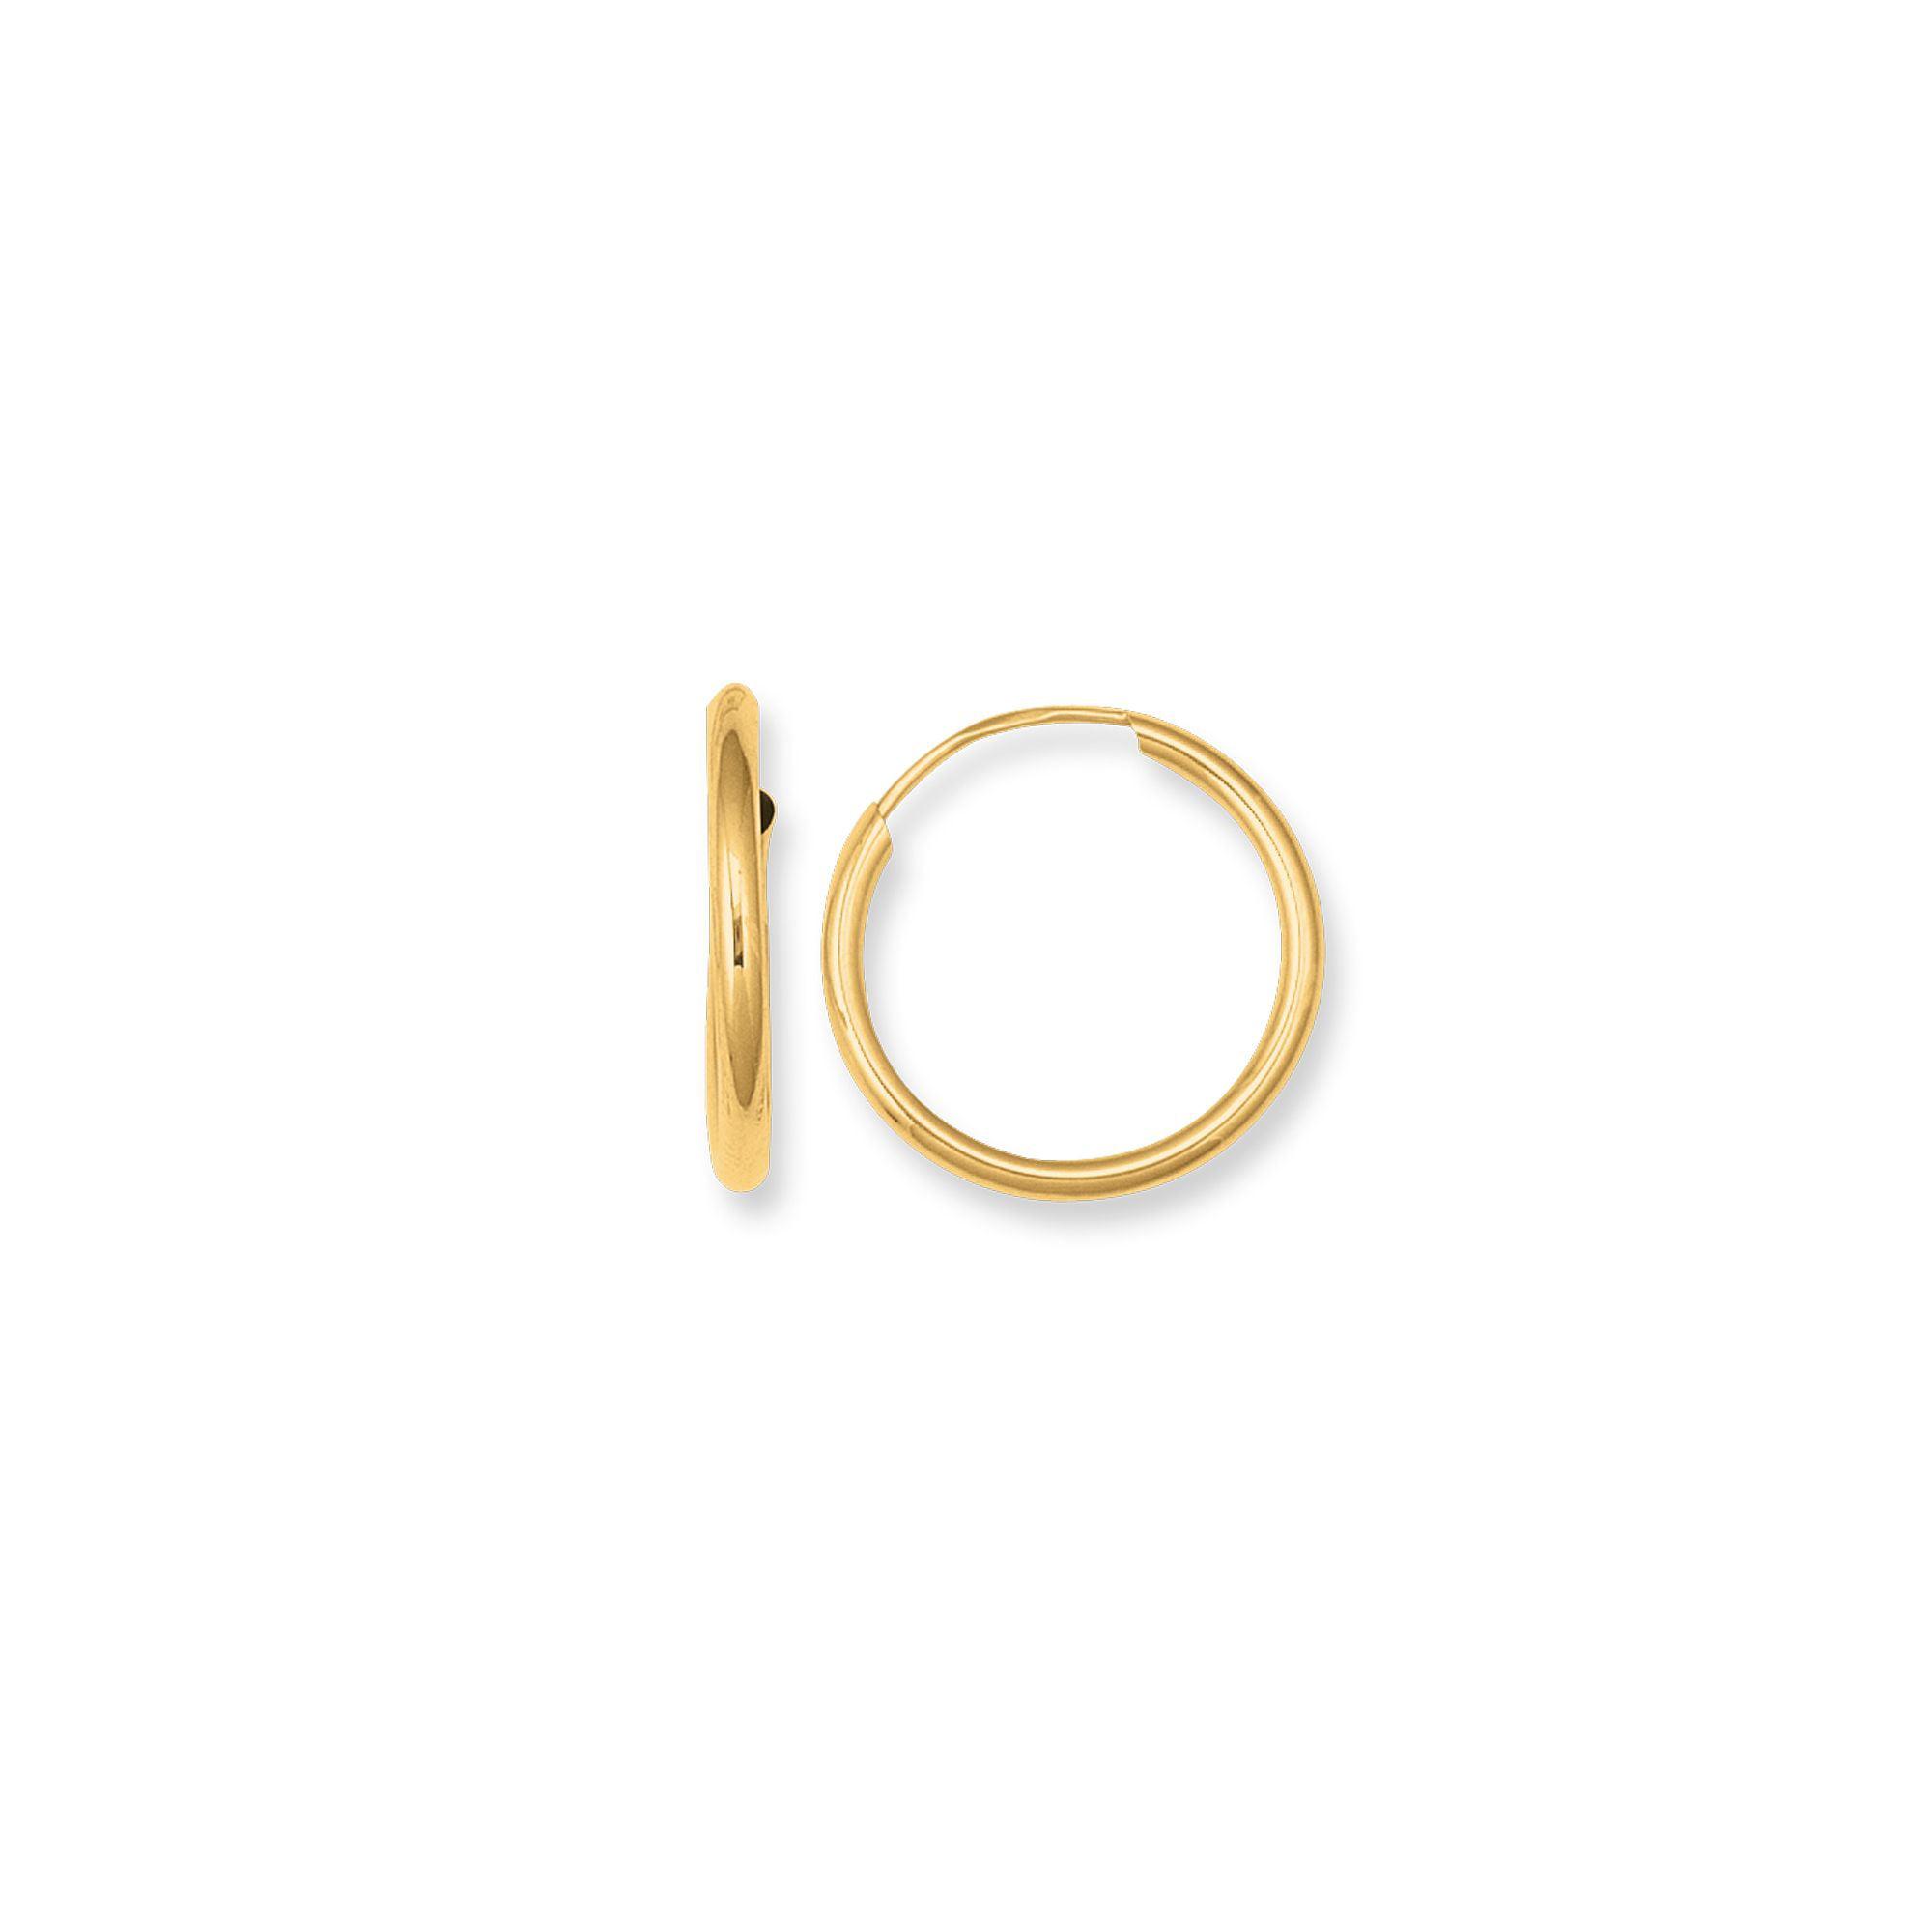 Antique Gold Vicenza Designs P2019 Cilento 9-Inch Pull Appliance